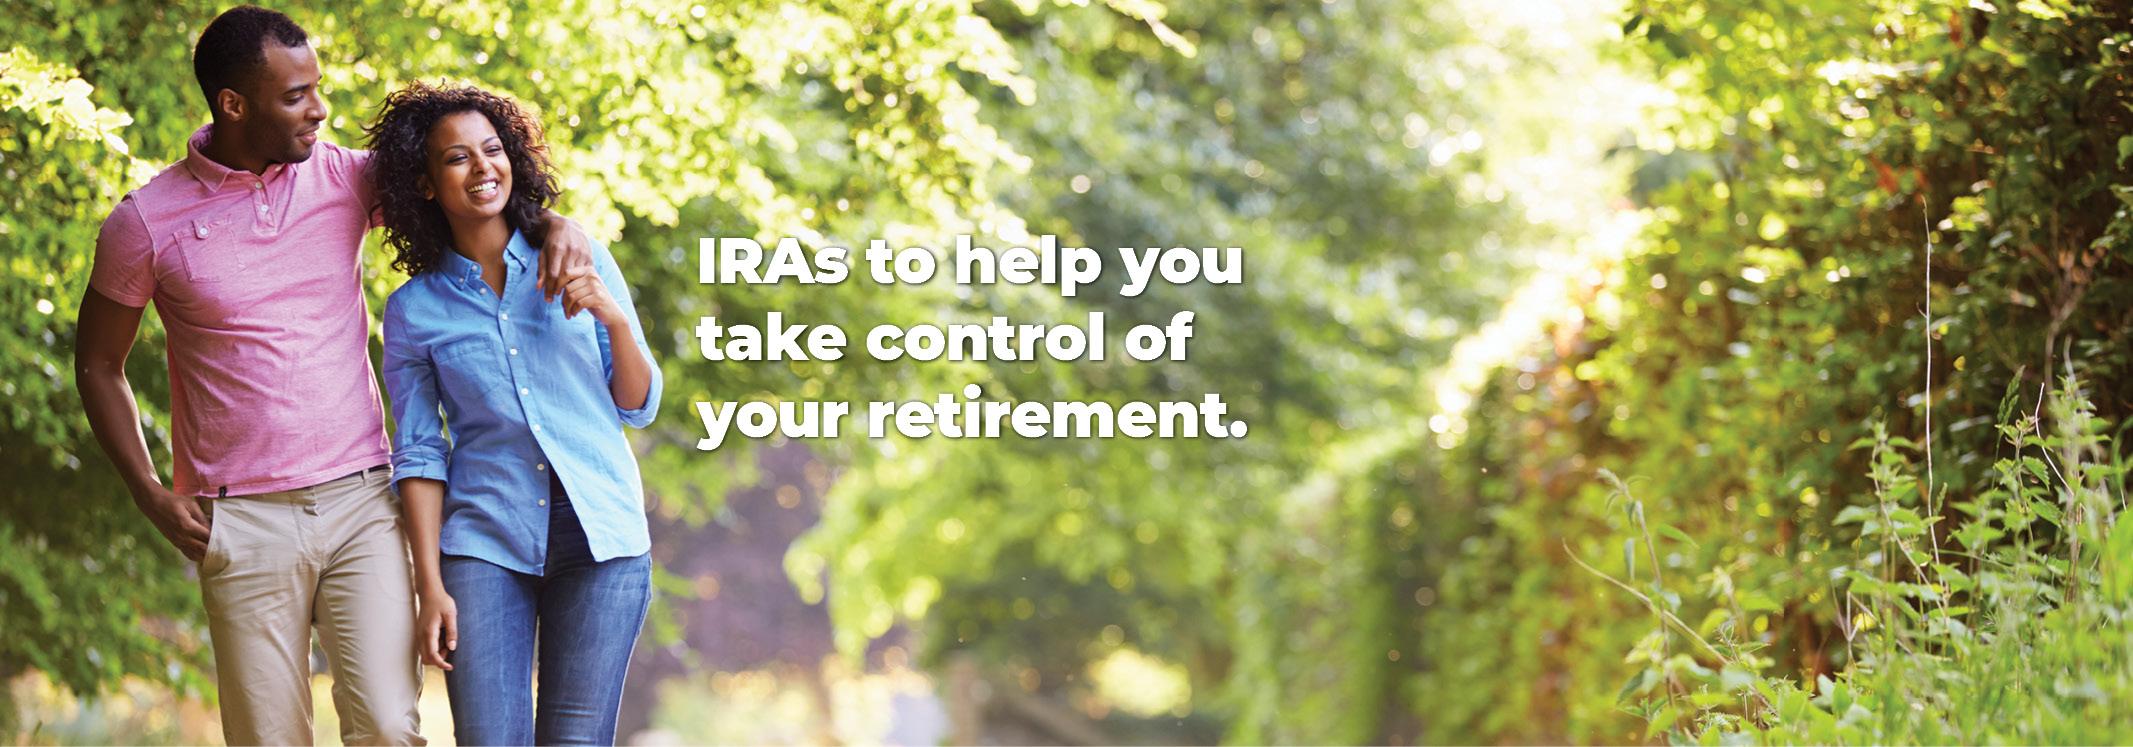 IRAs image slide